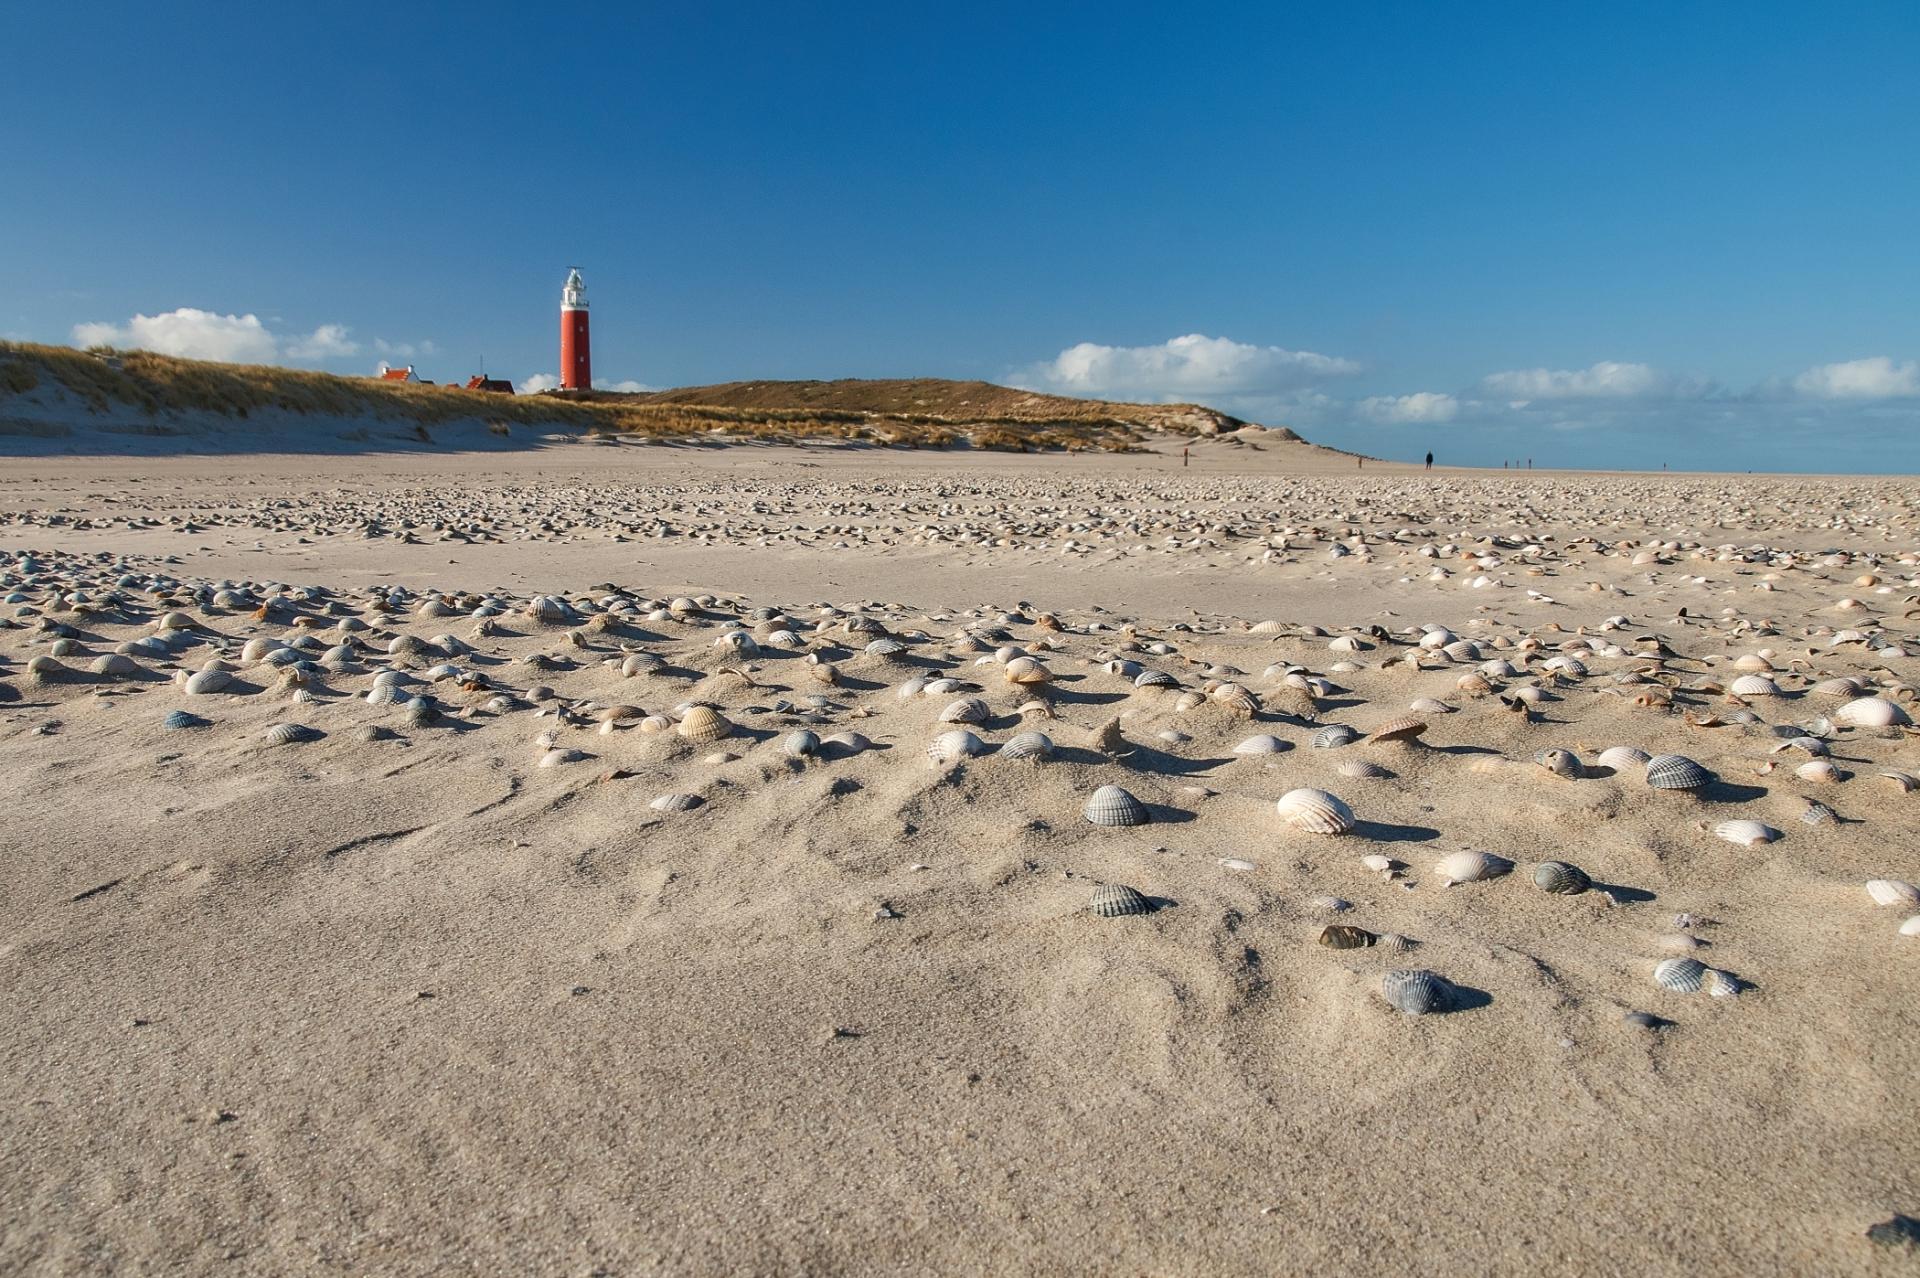 Vuurtoren met zandstrand VVV Texel fotograaf Justin Sinner